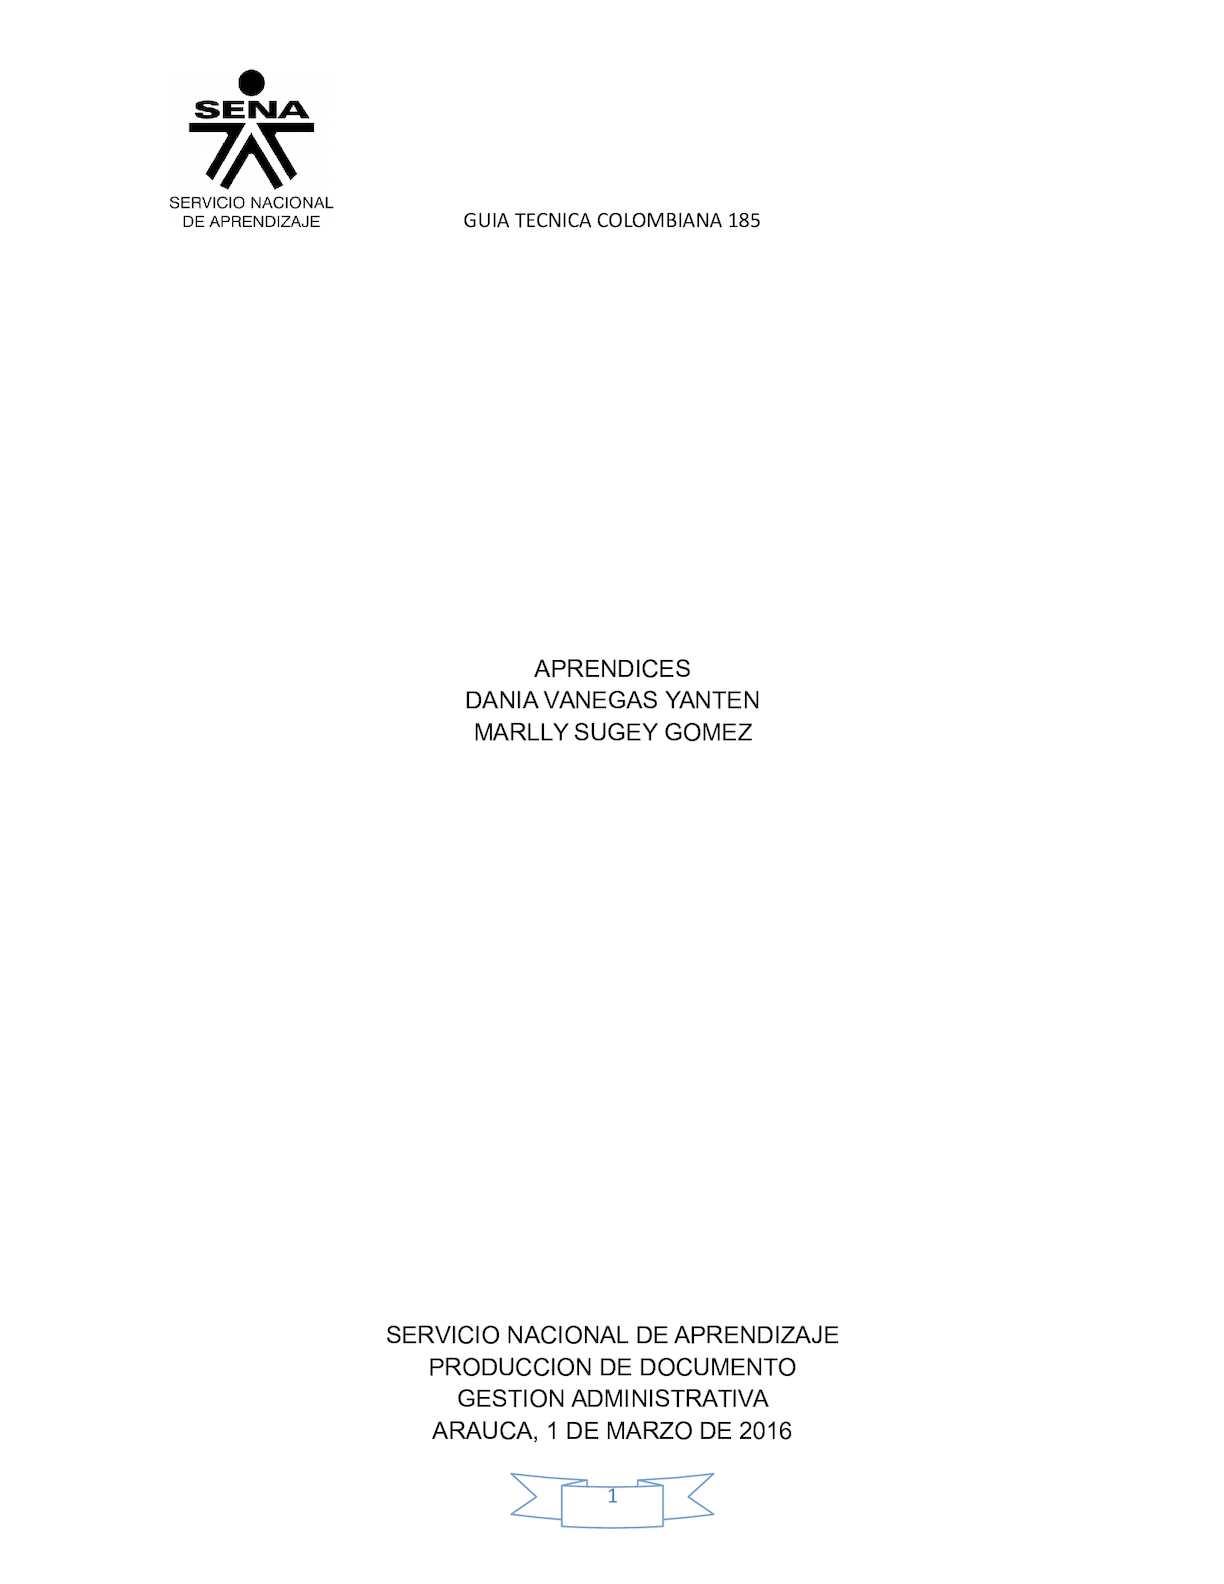 Taller Guia Técnica Colombiana Resuelto 185 (1)